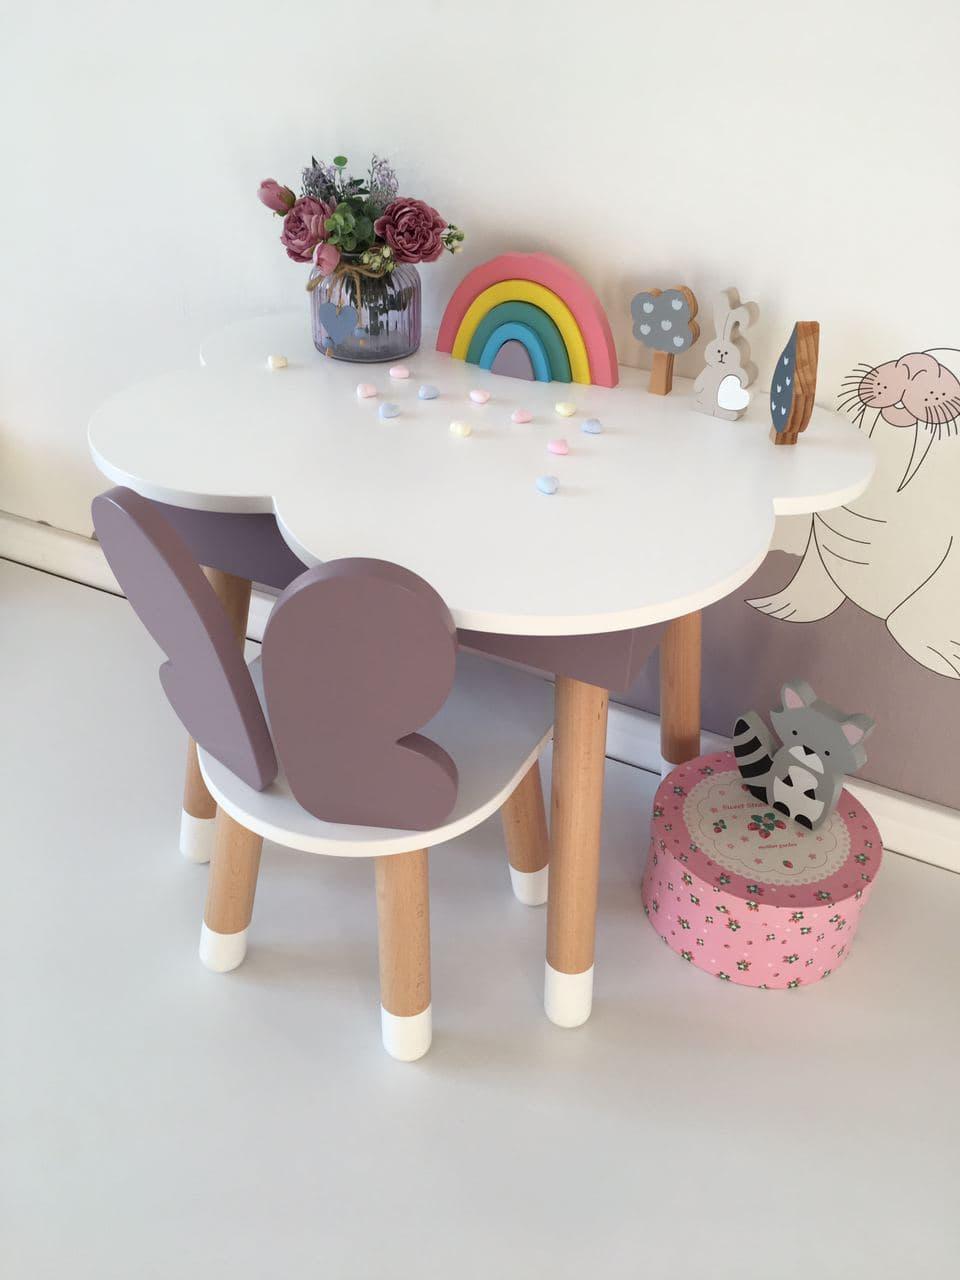 Стол полуоблако с пеналом и 1 стул бабочка